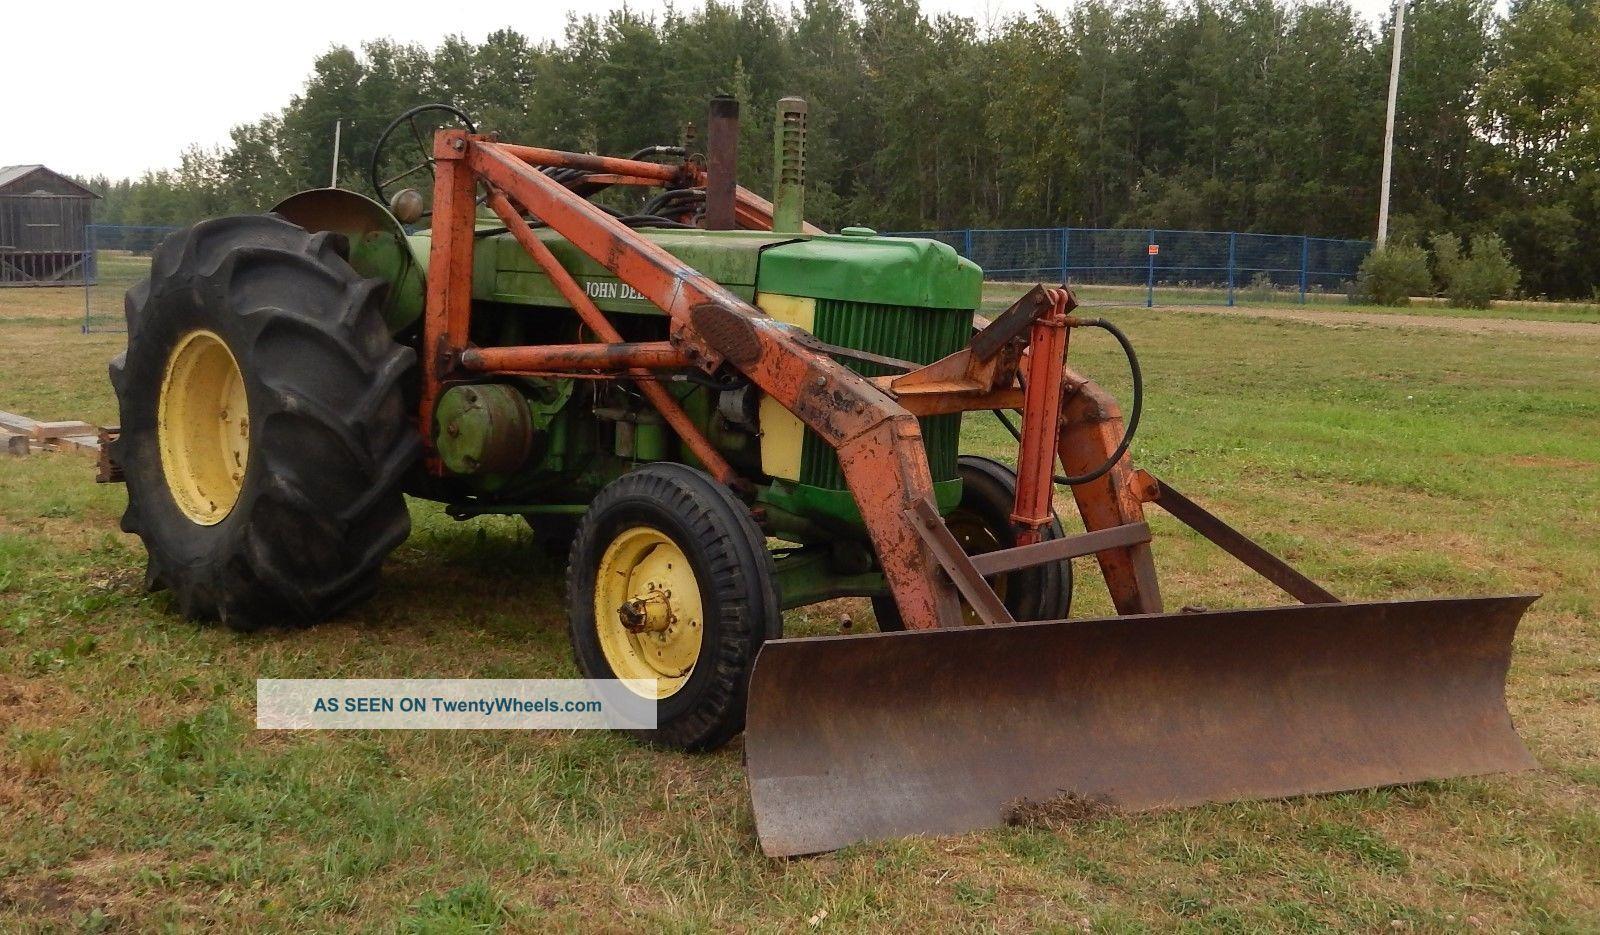 R John Deere Diesel Tractor Ie Du Al Front End Loader Lgw